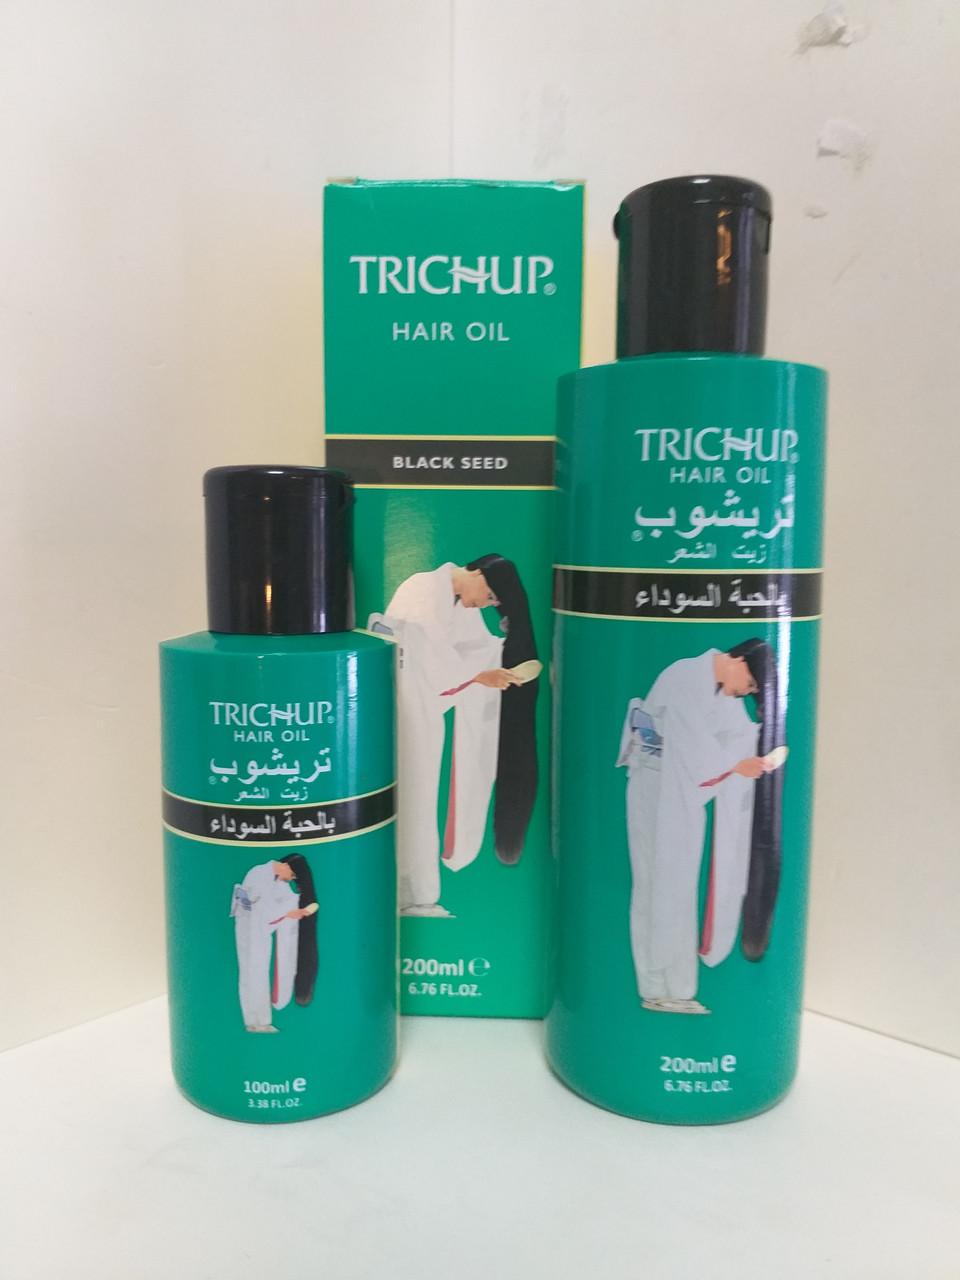 Тричап масло с Черным Тмином (Trichup Hair Oil Black Seed VASU), 100 мл